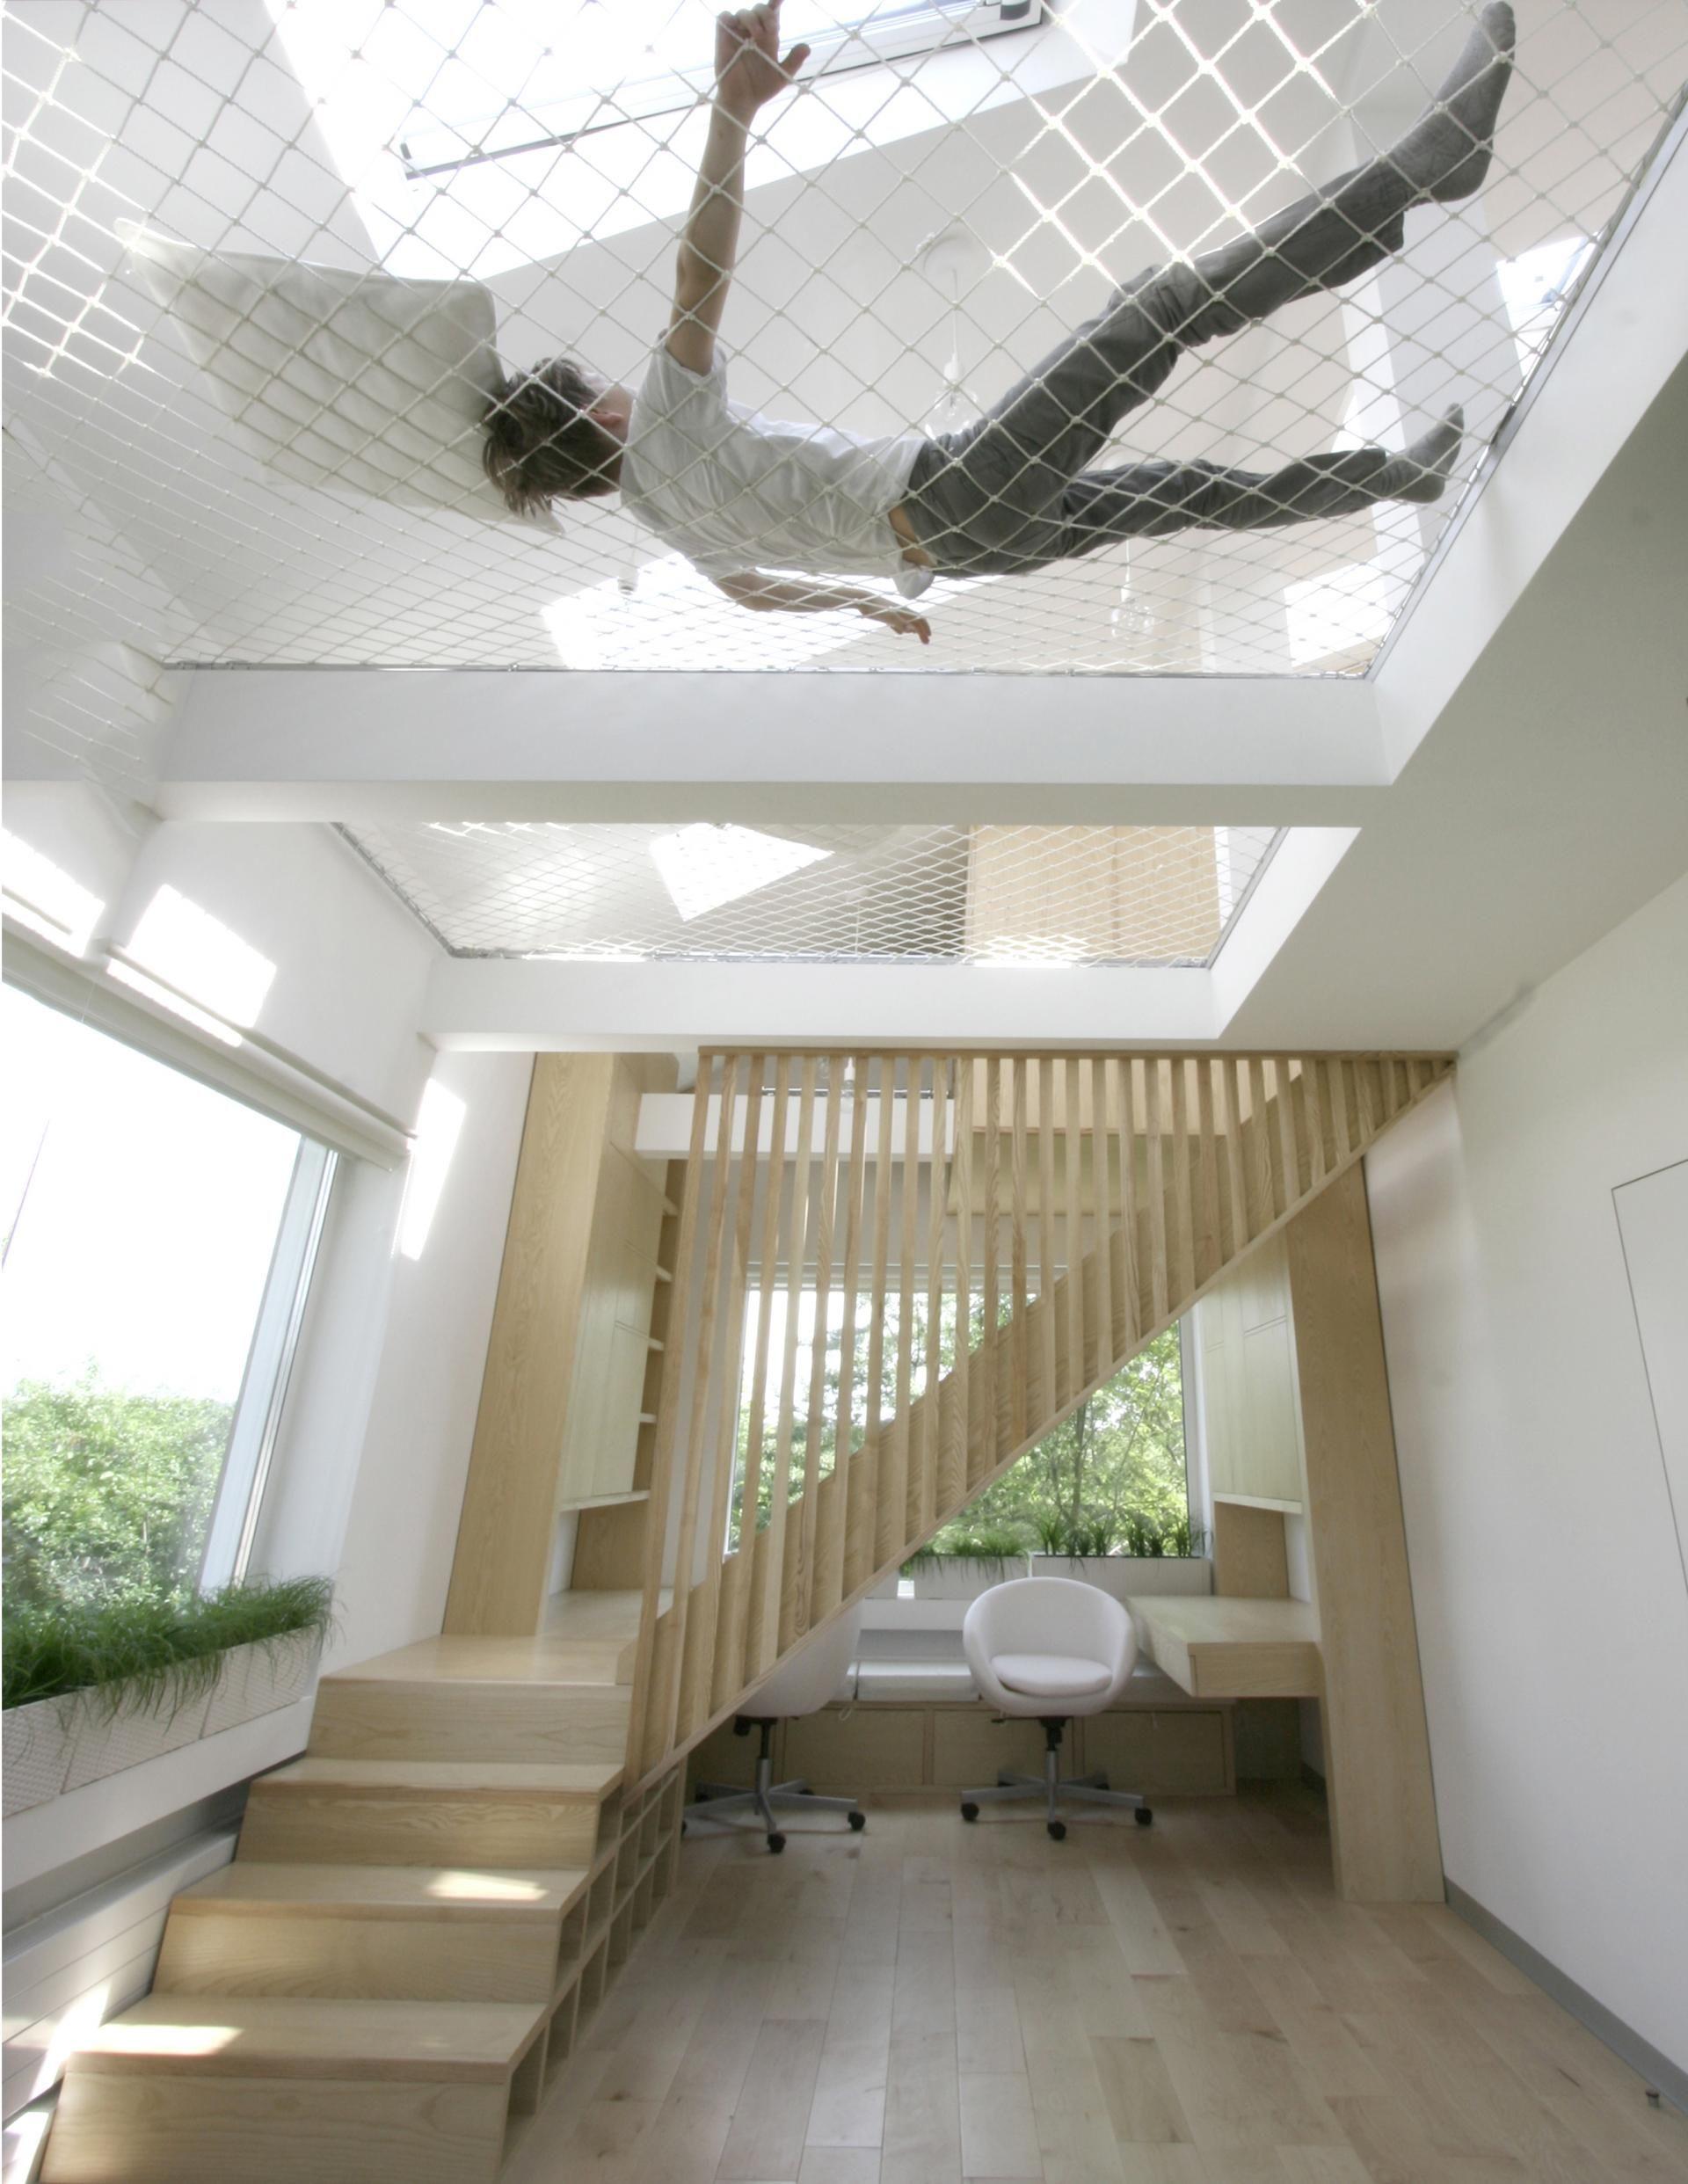 make l your in avazinternationaldance hammock hammocks a bedroom min to or for anywher terrace org balcony how